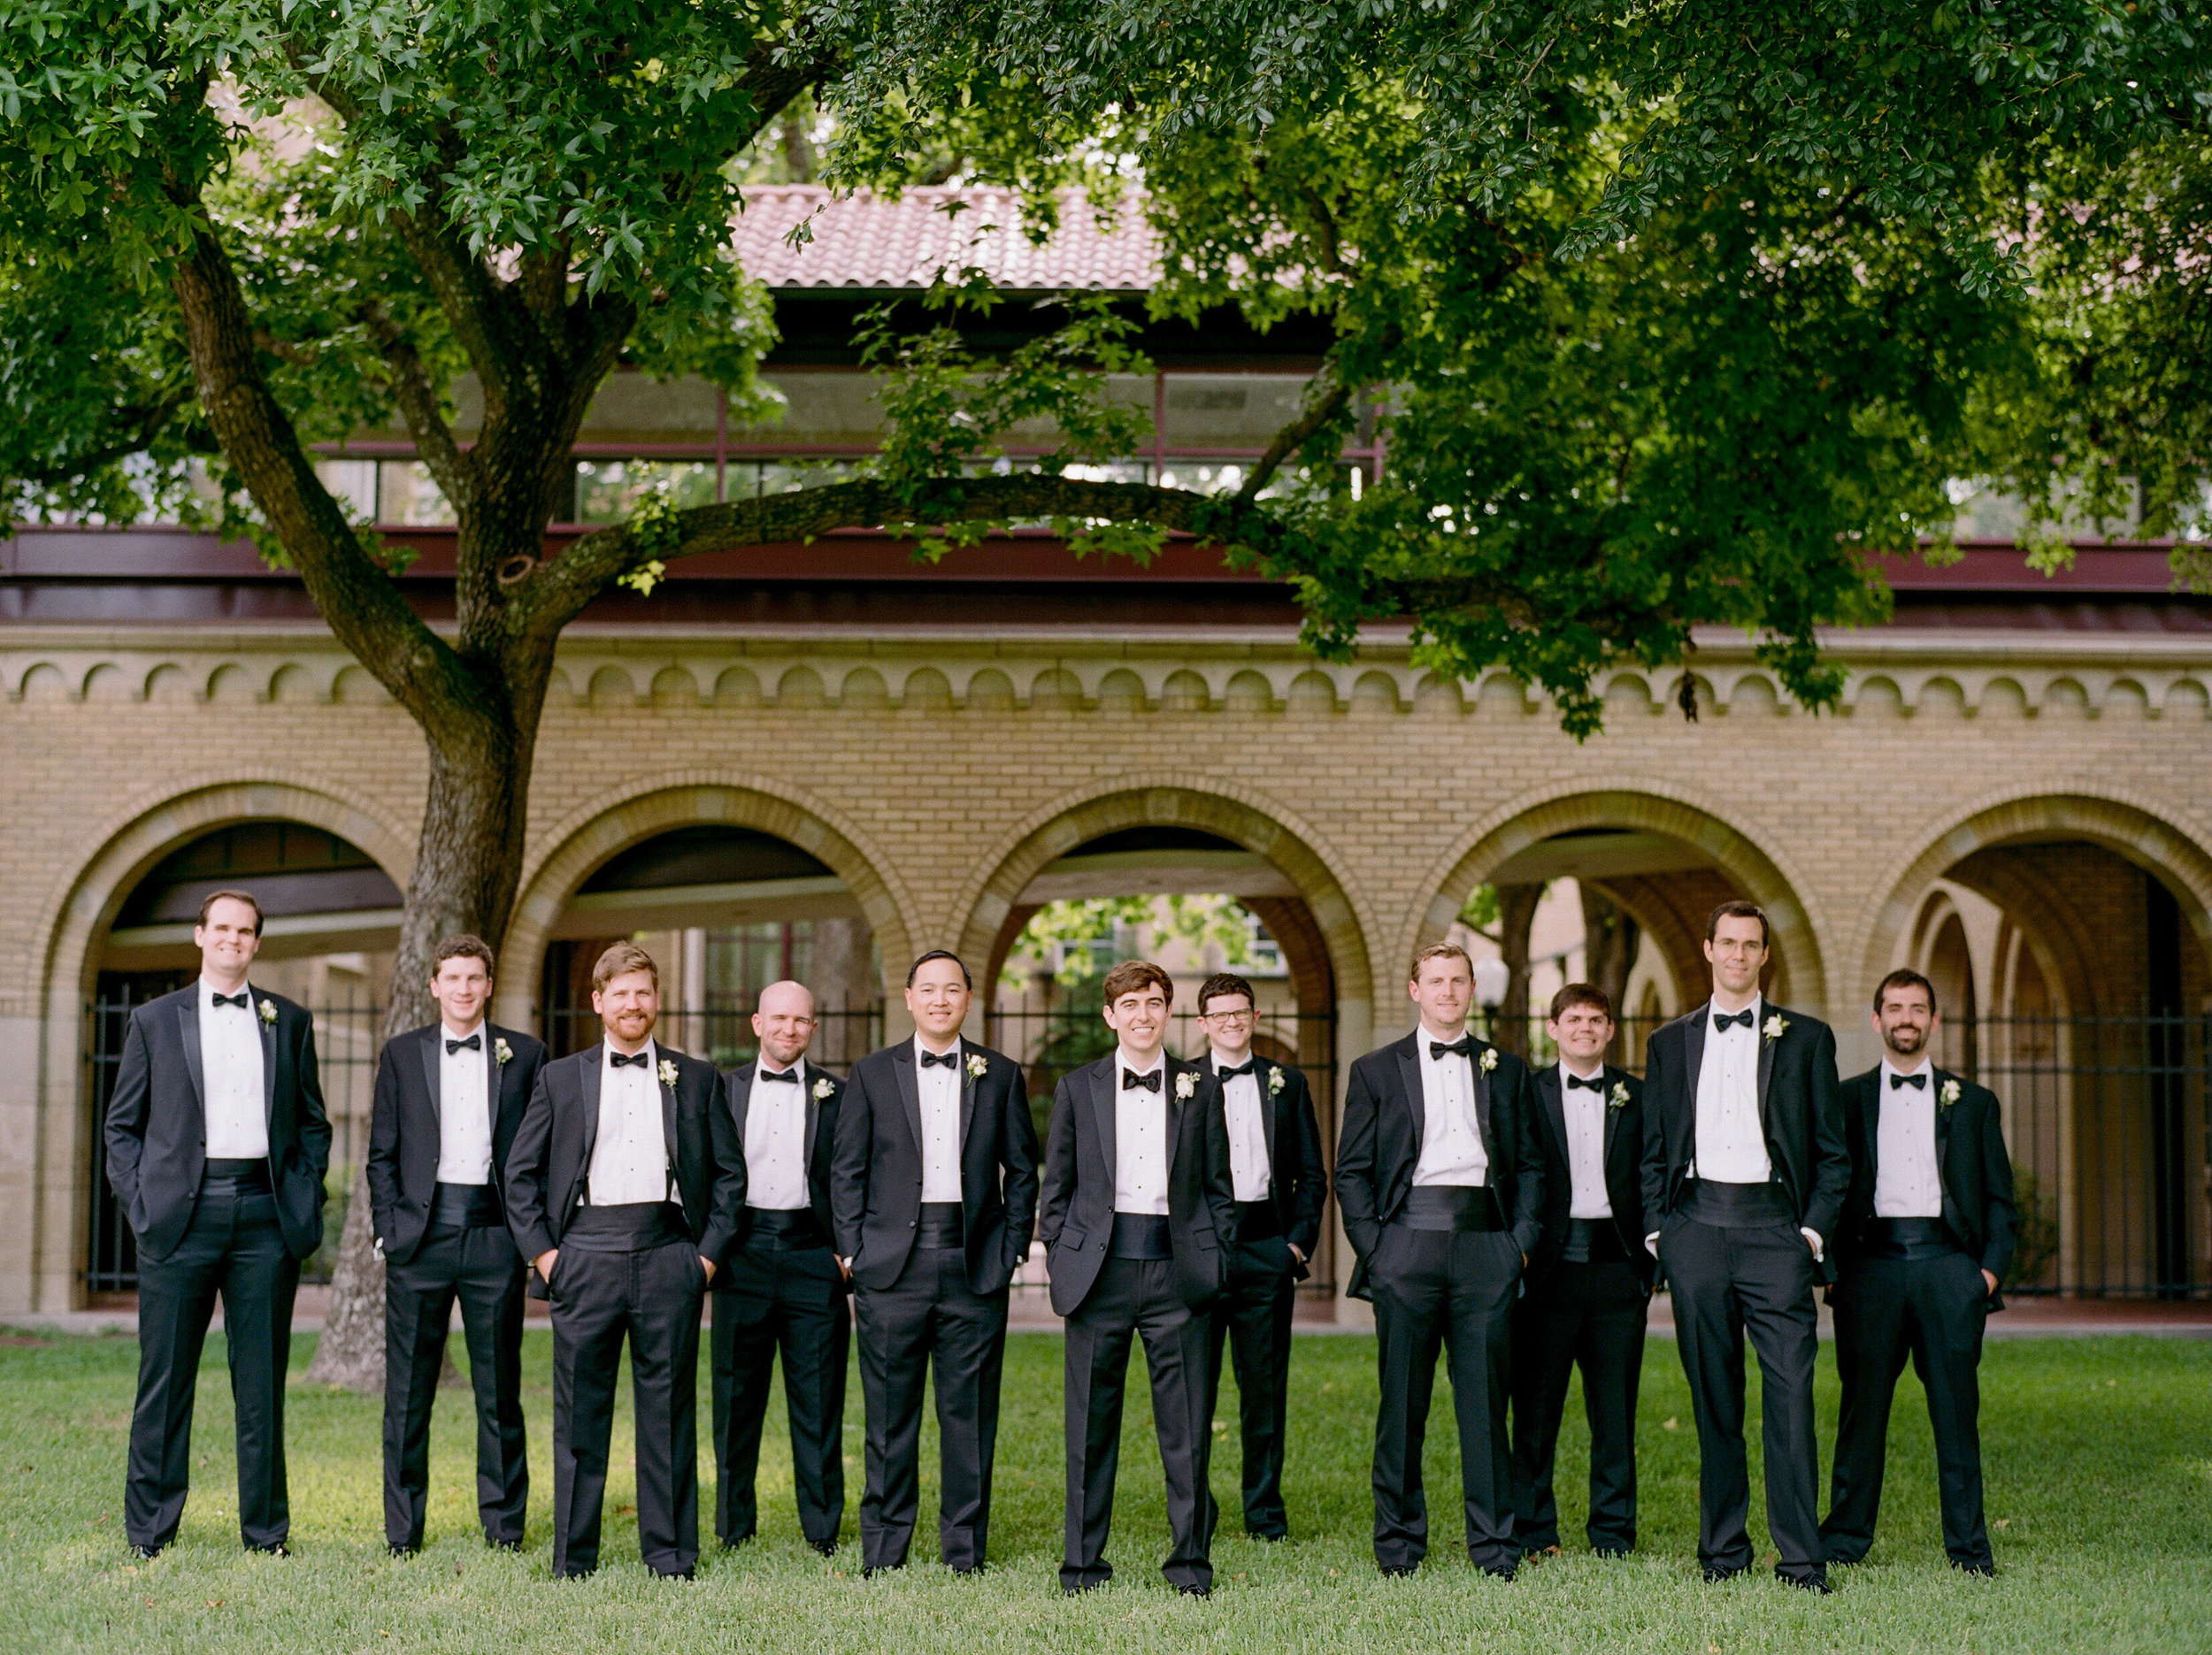 Fine-Art-Film-Houston-Wedding-Photographer-Best-Top-Luxury-Texas-Austin-Dallas-Destination-Dana-Fernandez-Photography-River-Oaks-Country-Club-South-Main-Baptist-Ceremony-Reception-Wedding-25.jpg